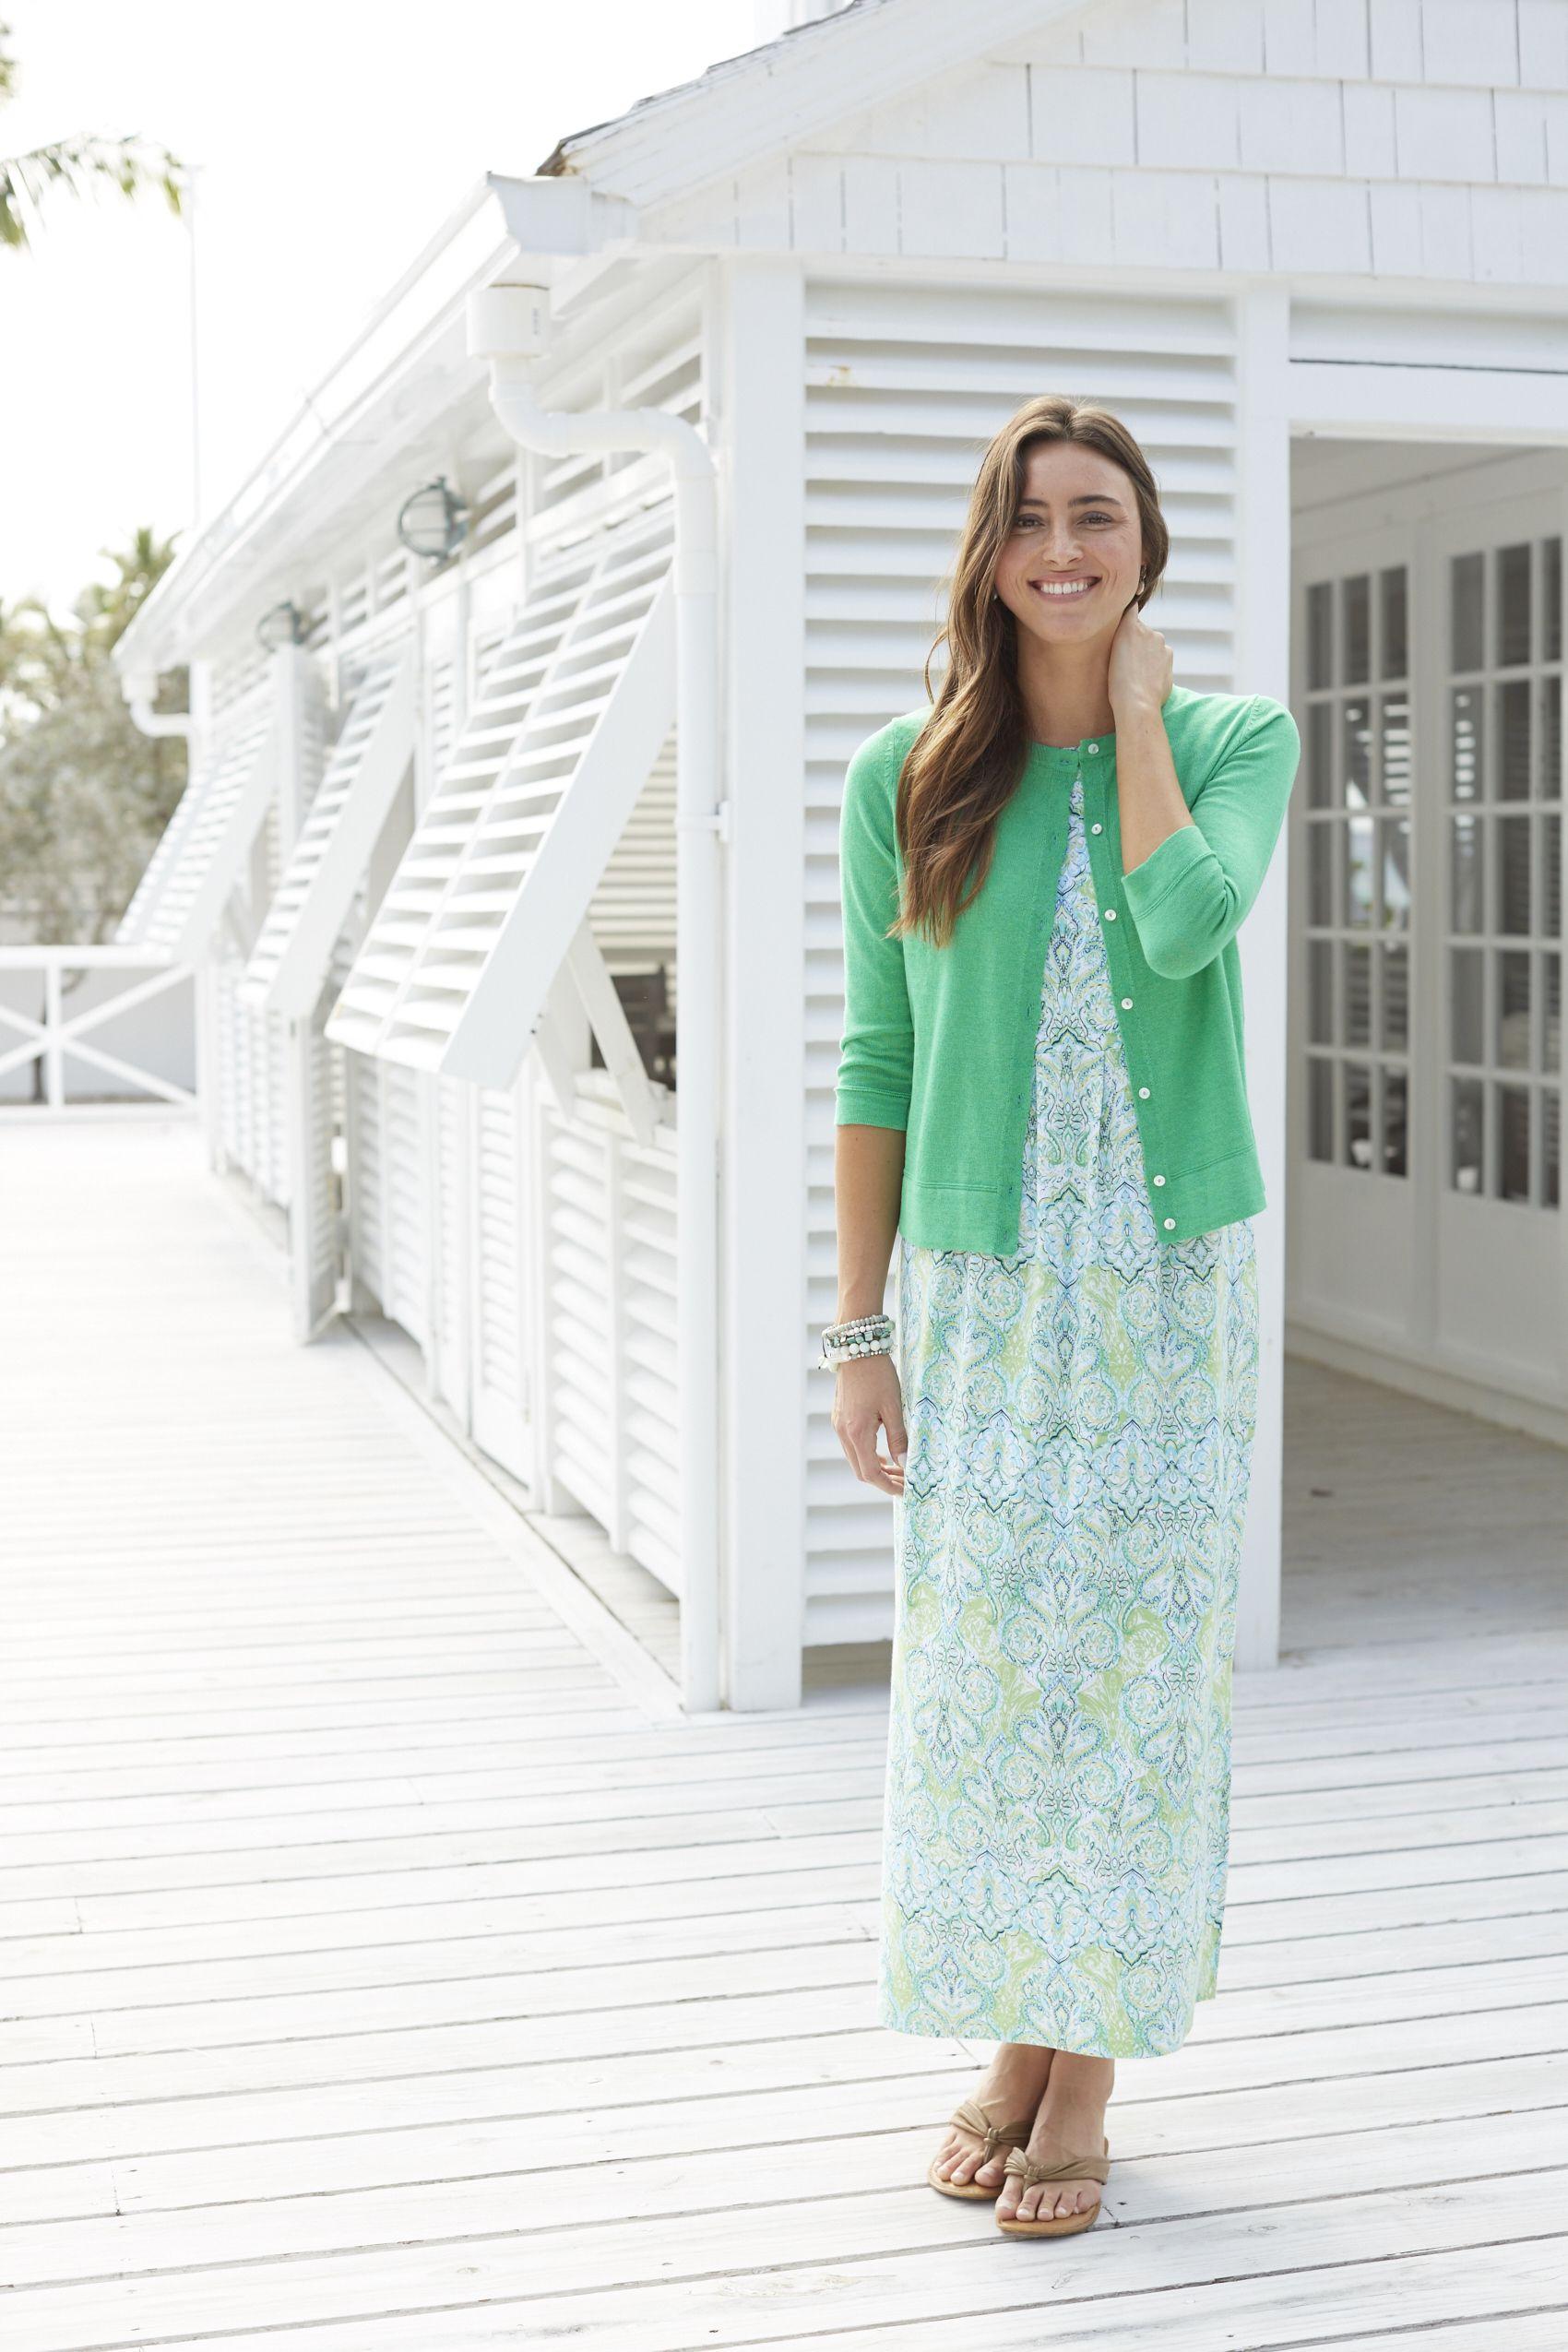 Printed Empire Waist Knit Maxi Dress From J Jill Maxi Knit Dress Summer Dresses Womens Dresses [ 2550 x 1700 Pixel ]